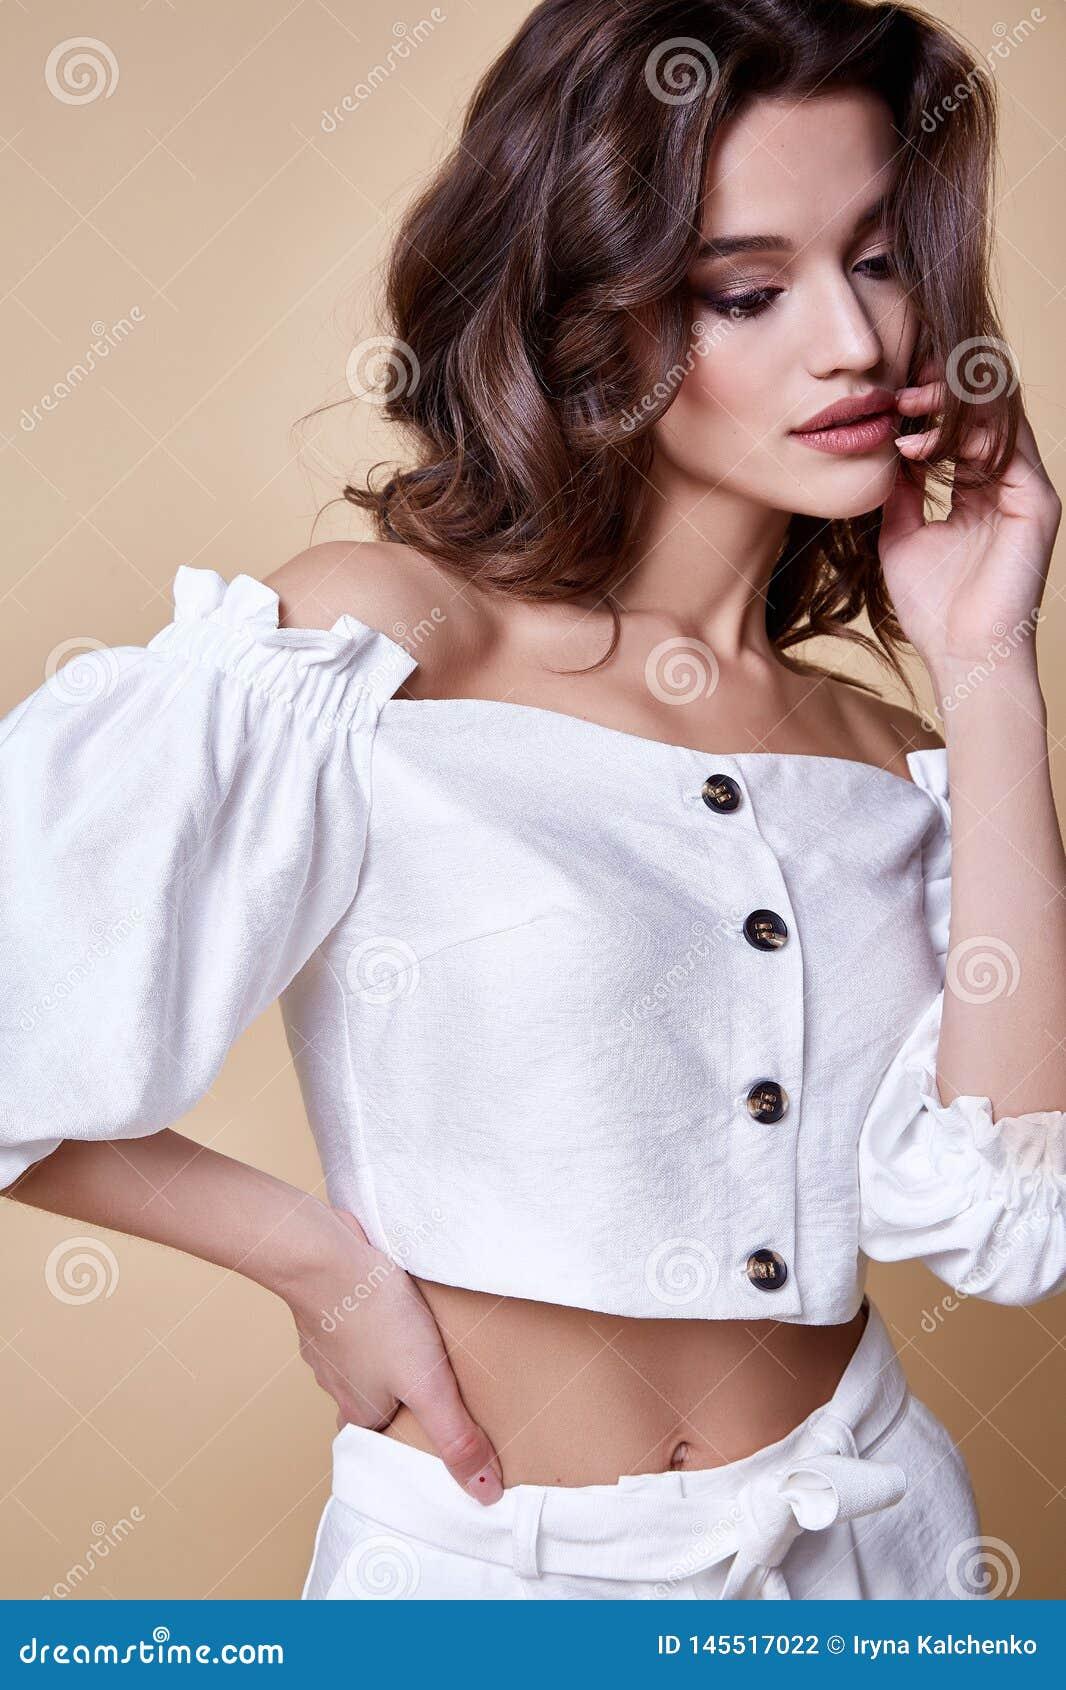 Portrait of beautiful woman perfect face cosmetic skin care beauty salon hairdo hair style model blush mascara lipstick